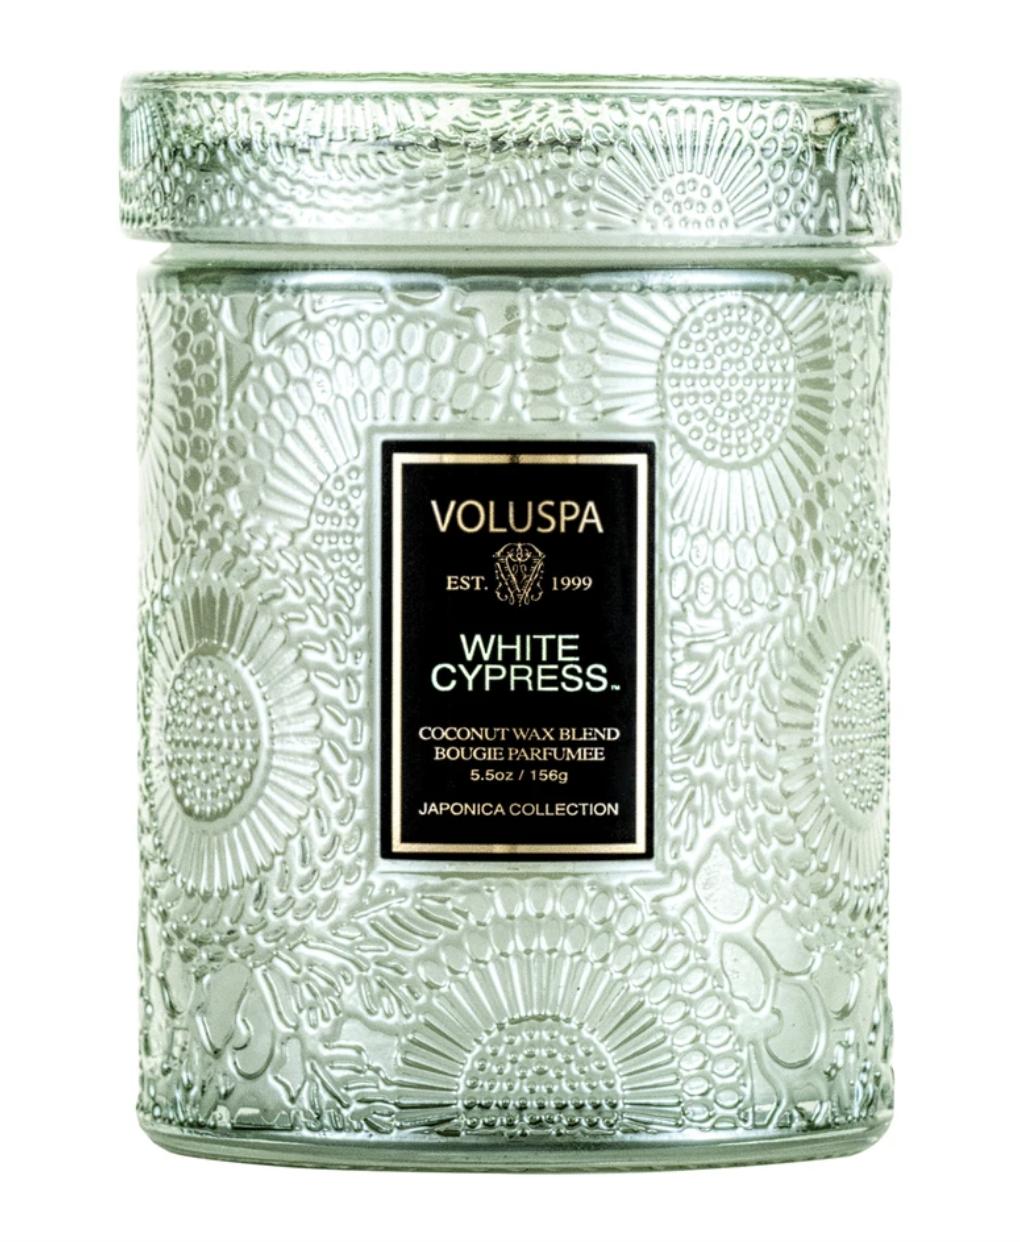 Voluspa White Cypress, Embossed Glass Jar with Lid